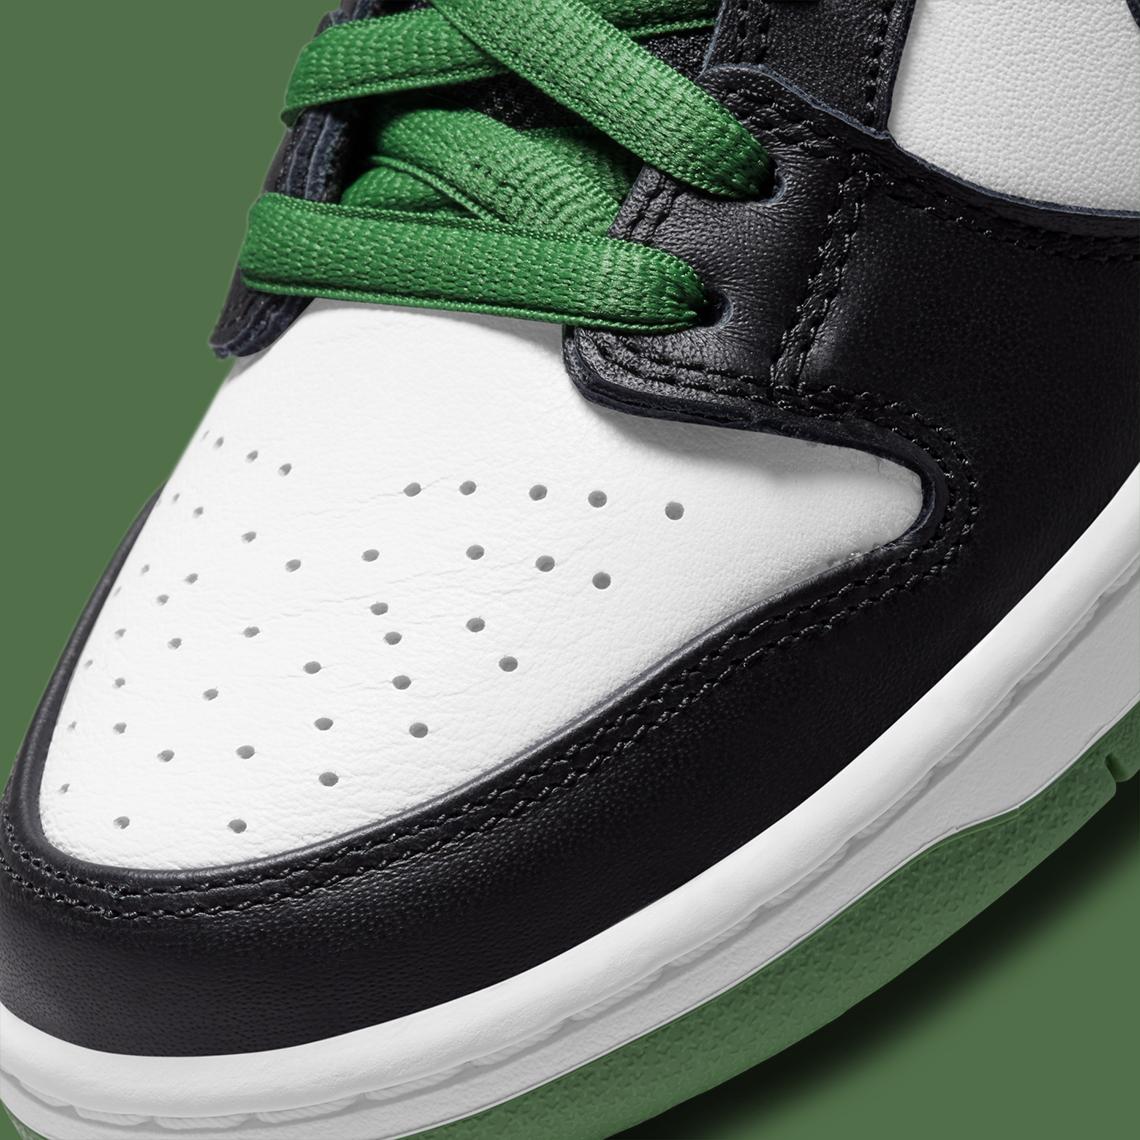 Nike SB Dunk Low ''Classic Green'' - BQ6817-302